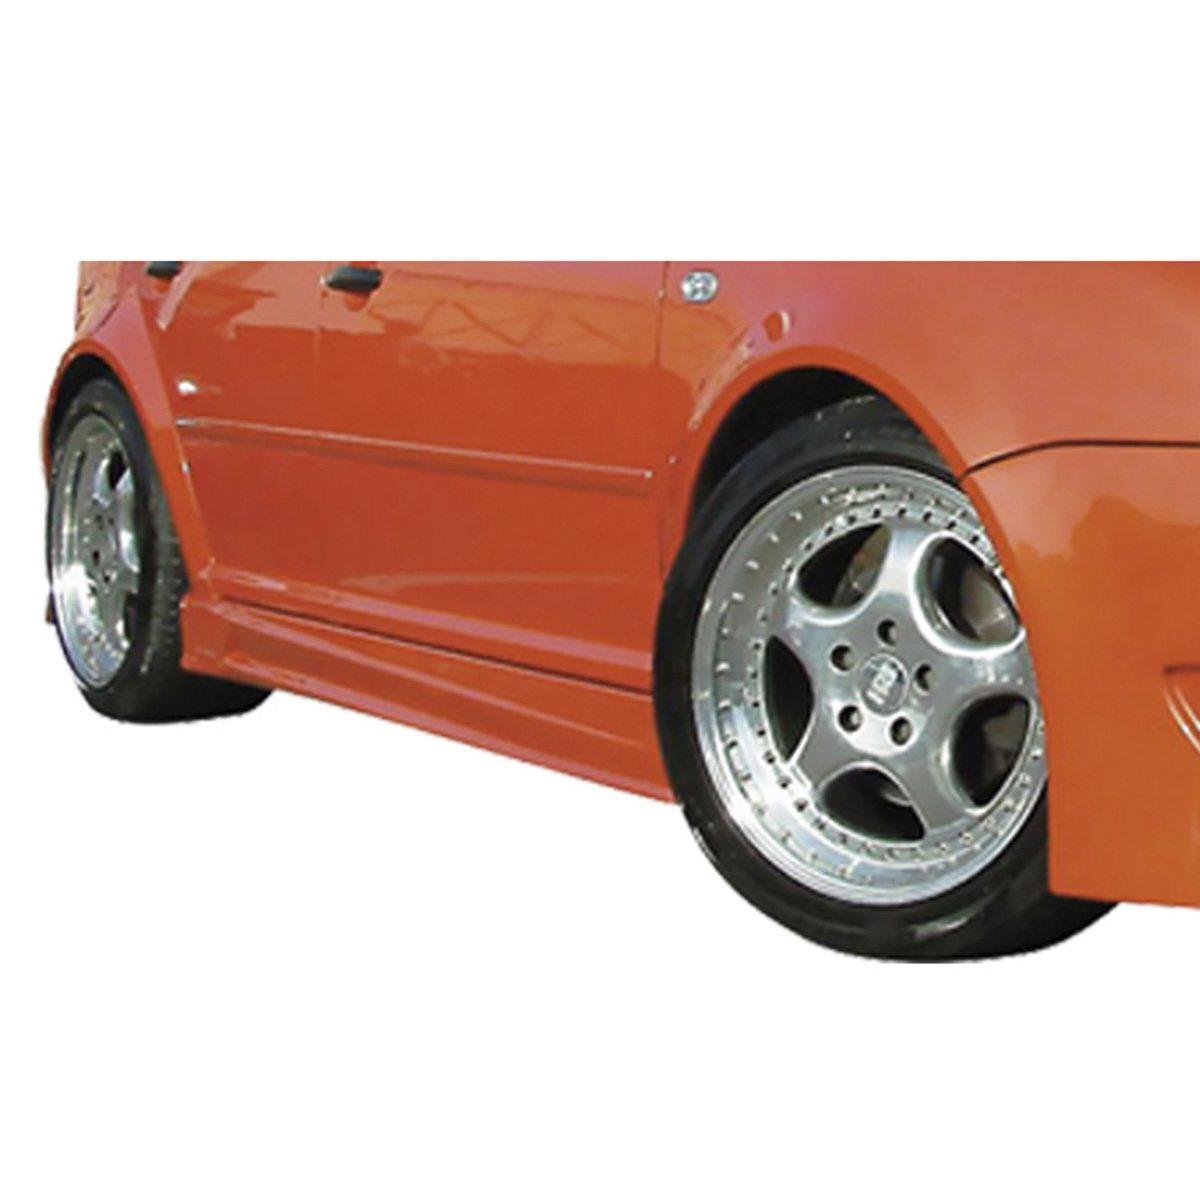 VW-Golf-IV-Summer-Emb-EBU0429